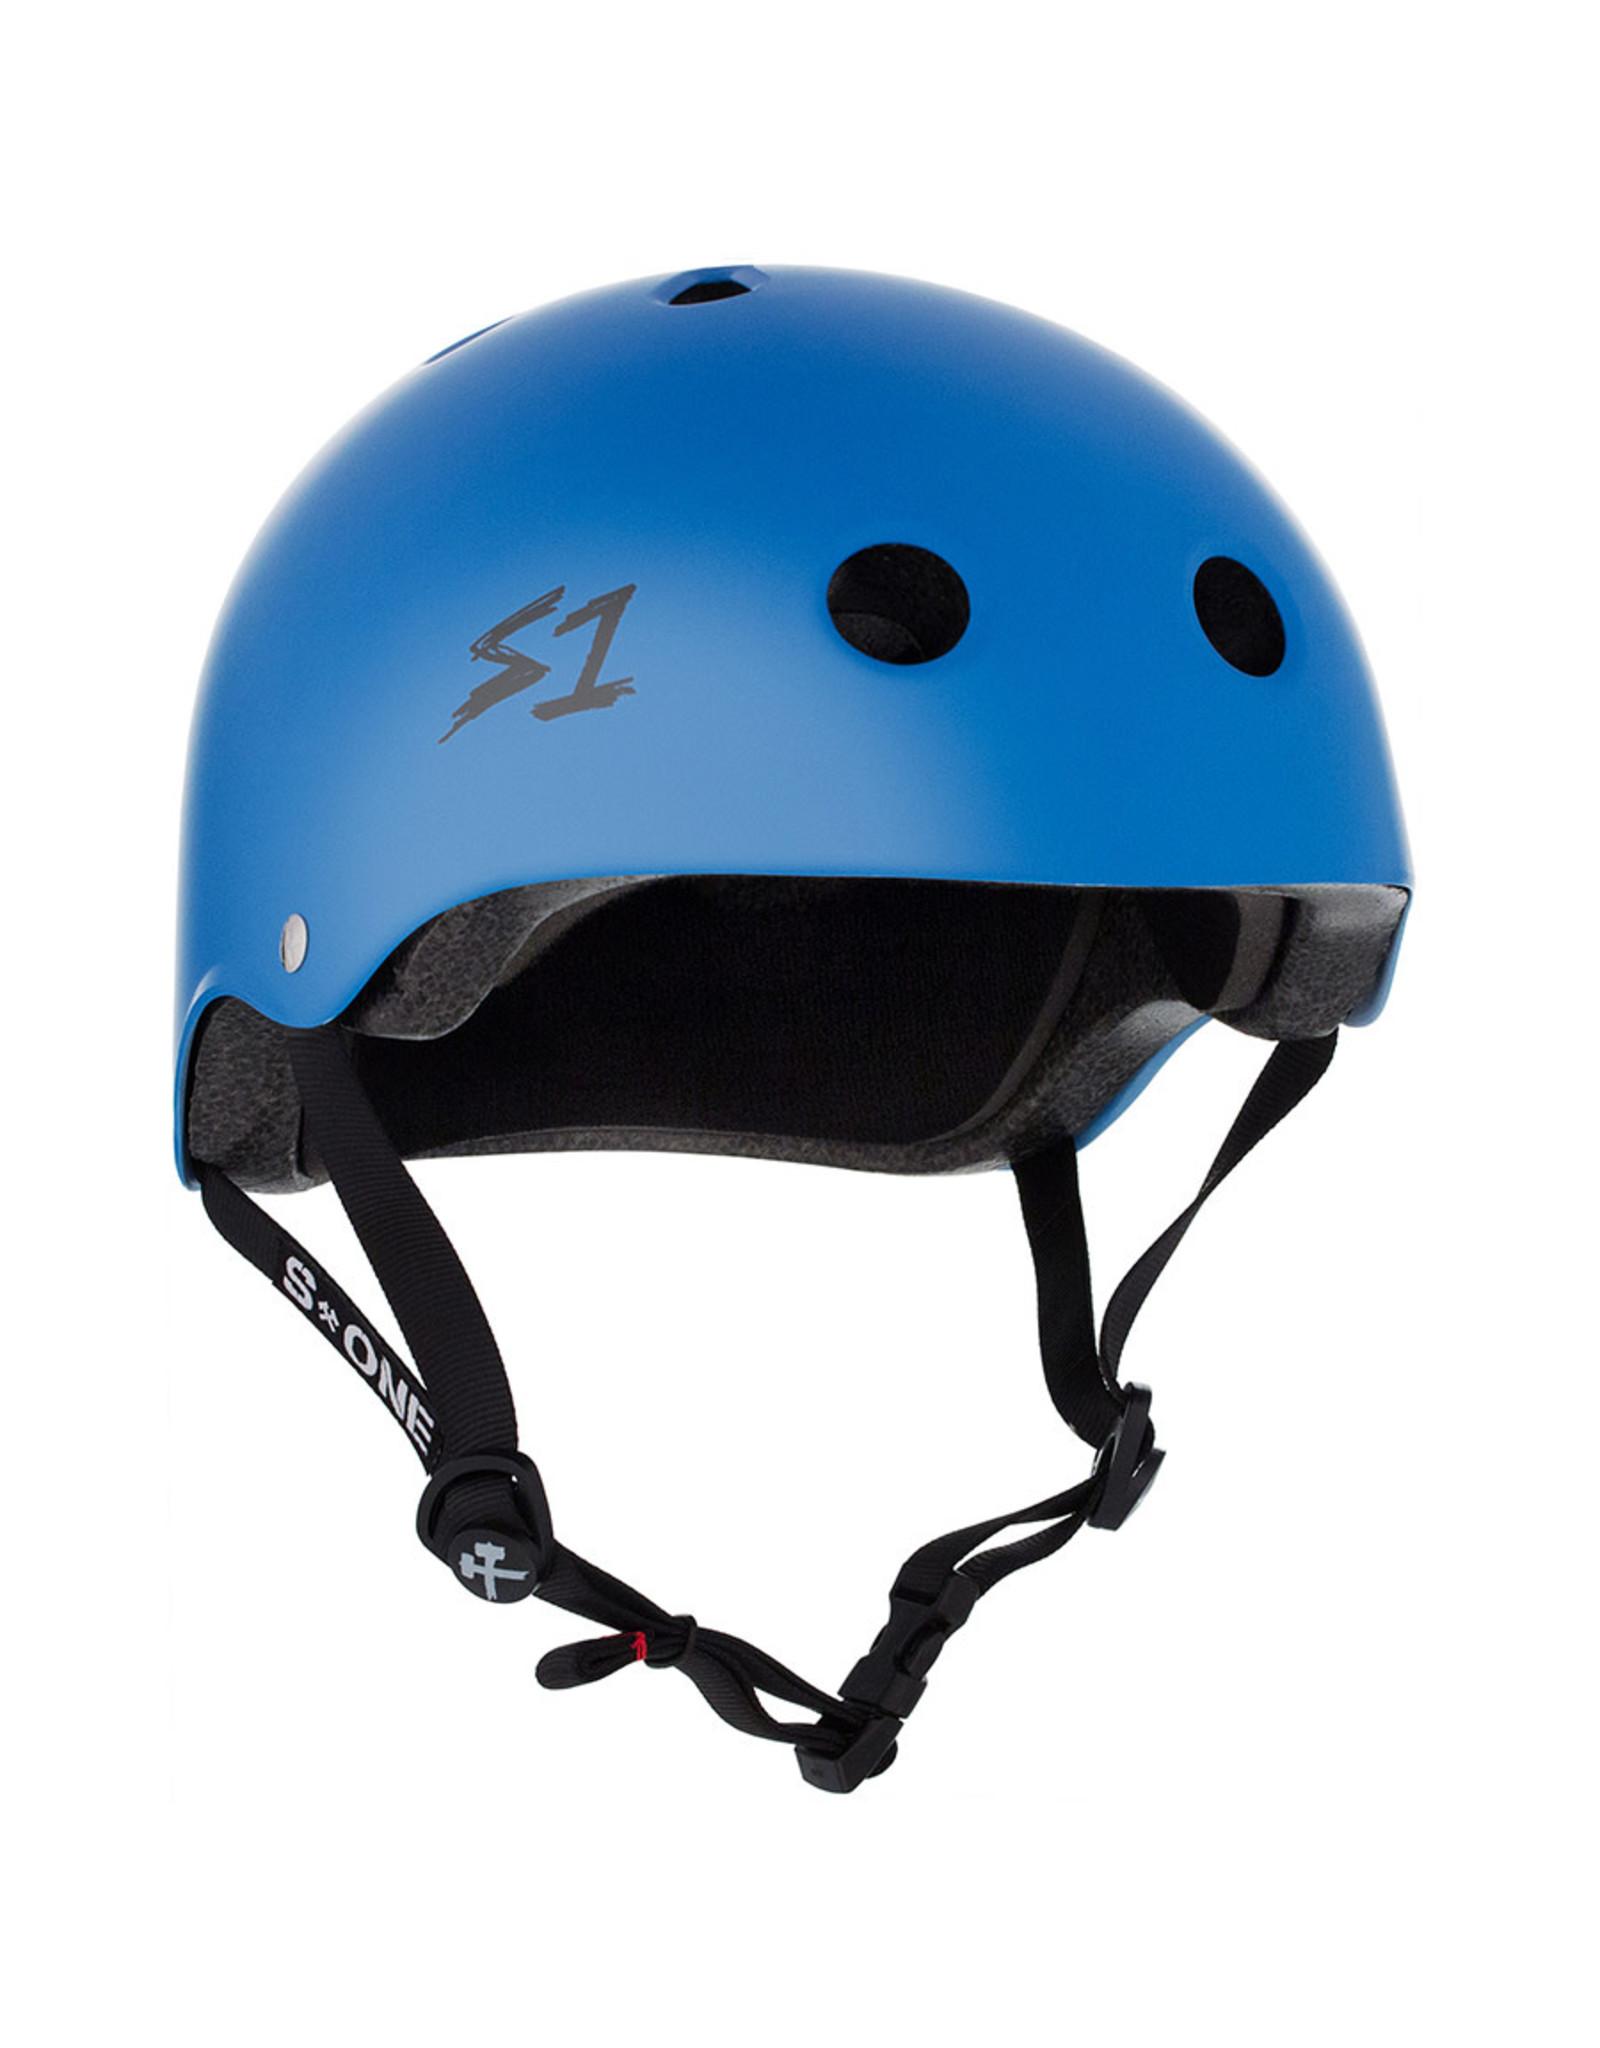 S-One S-One Helmet The Adult Lifer (Cyan Matte/Black Straps)